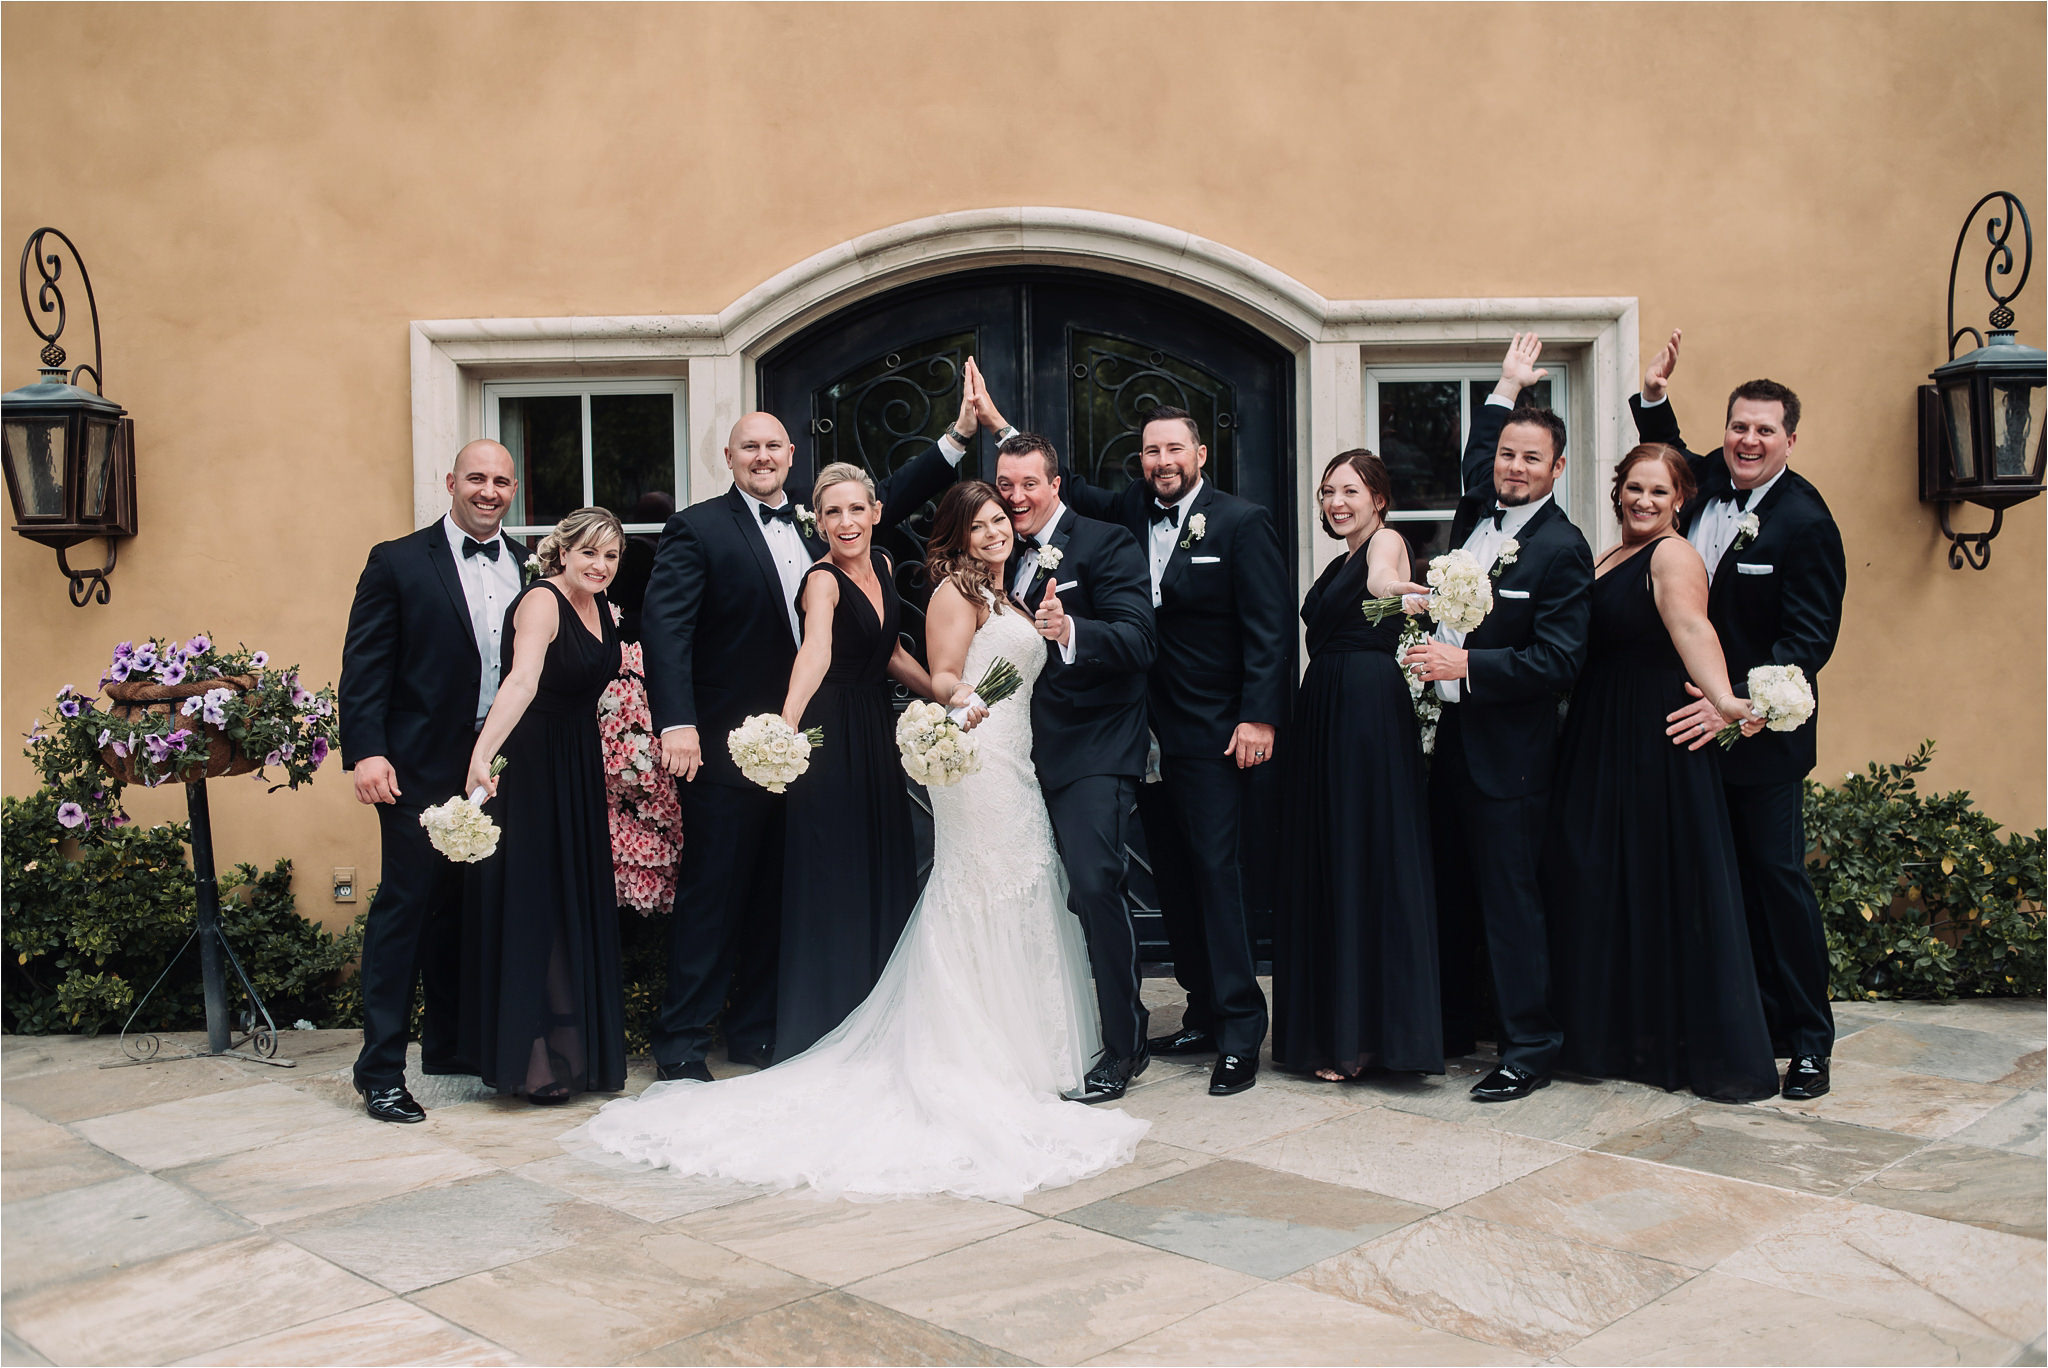 jessica-roman-photography-arden hills wedding photograpger-sacramento-boise-18.jpg